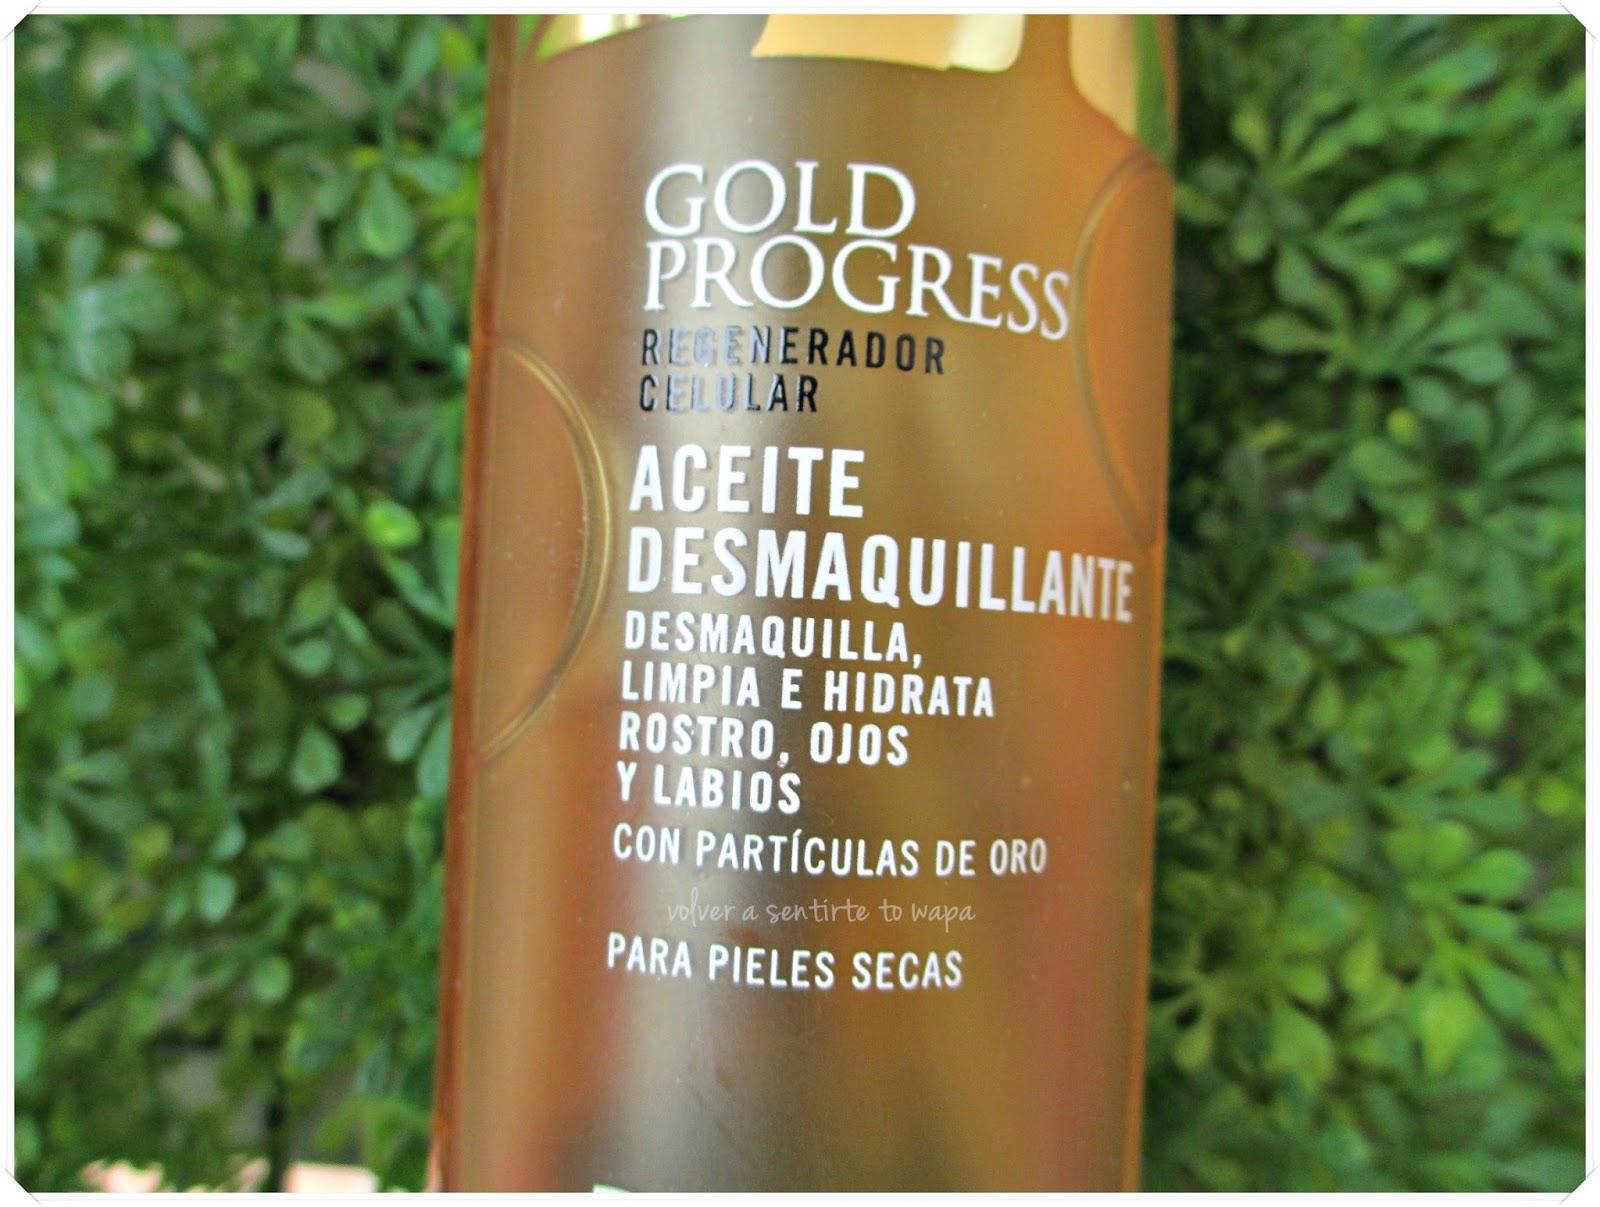 Aceite desmaquillante de Deliplús Gold Progress 14k - Review